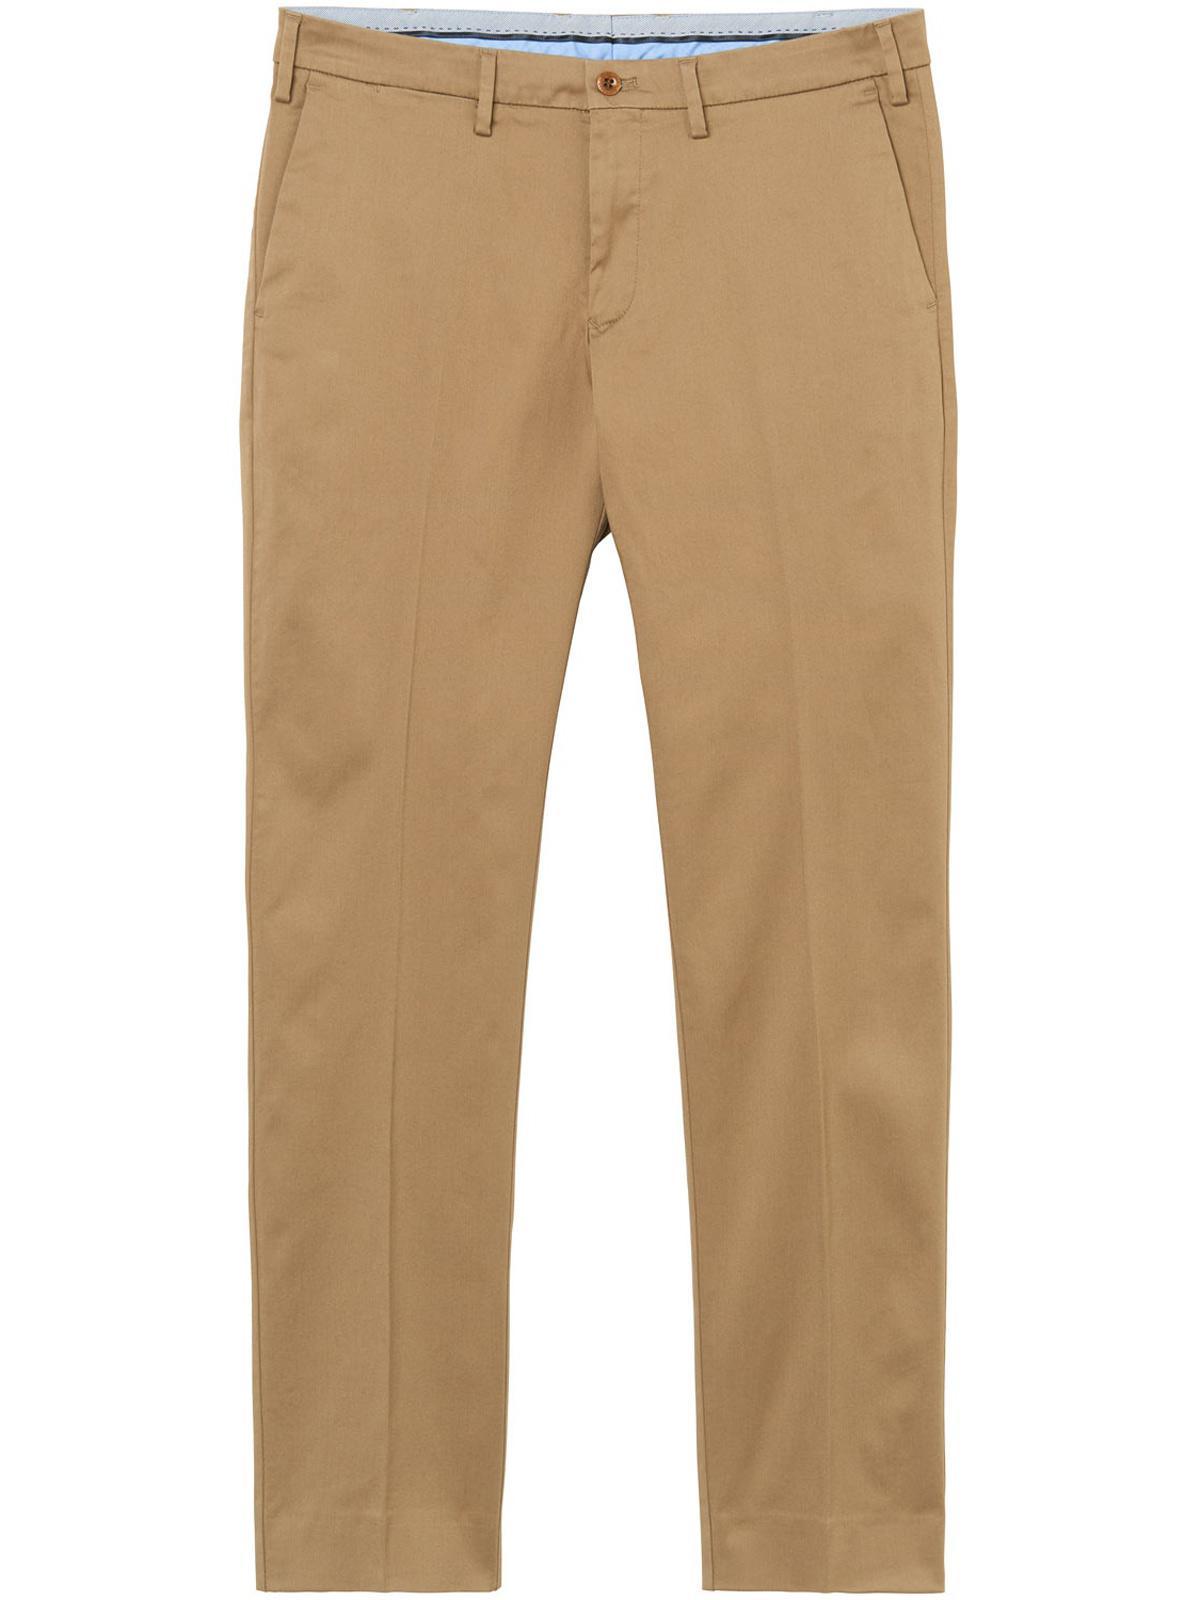 Mens Tailored Satin Slacks Slim Jeans GANT 6H4ra97Xr4